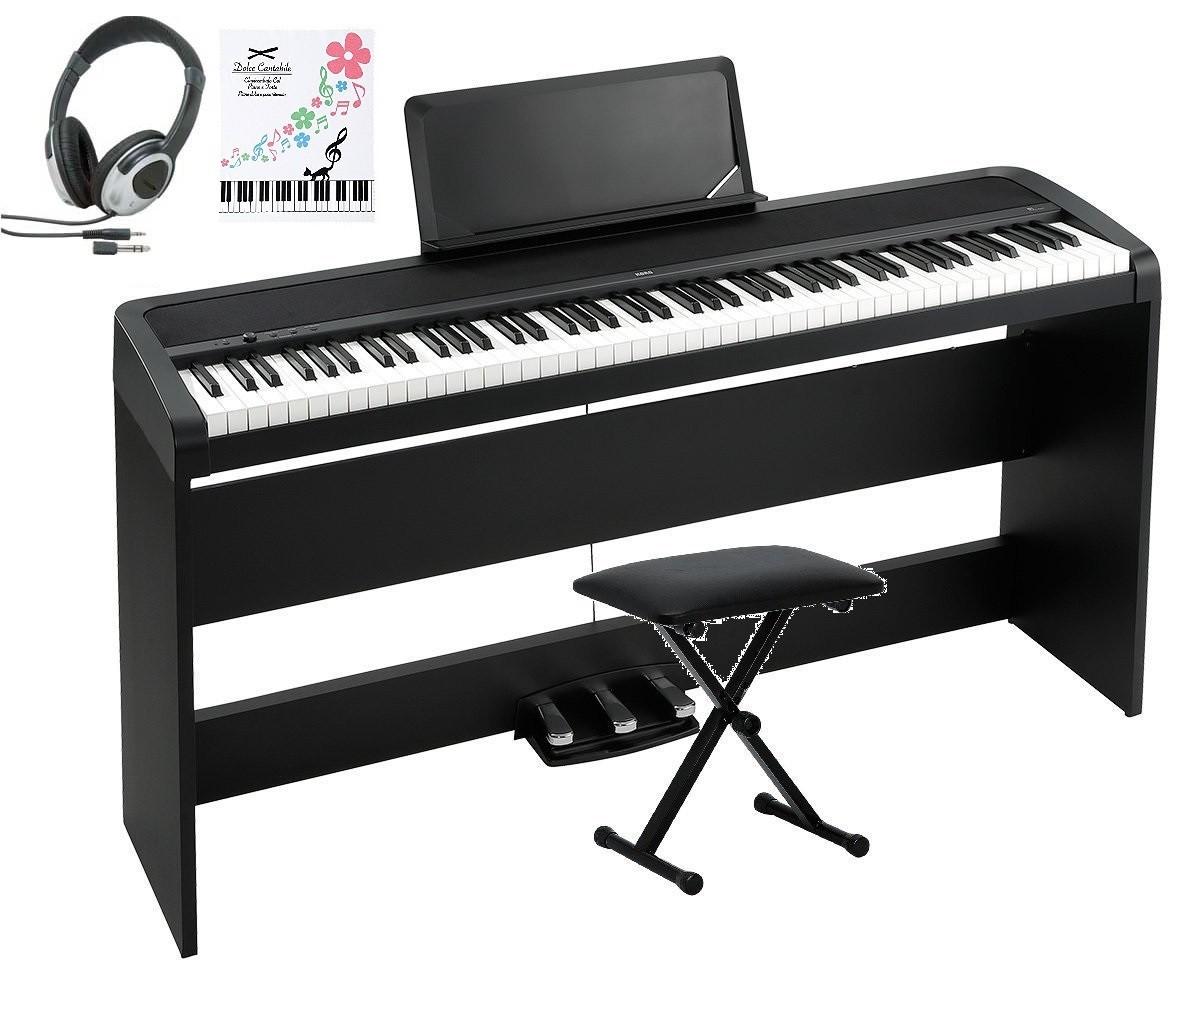 KORG B1SP BK コルグ 電子ピアノ 専用スタンド STB1 3本ペダル 椅子 ヘッドホン(密閉型) クロス 付属 オプション 専用カバー